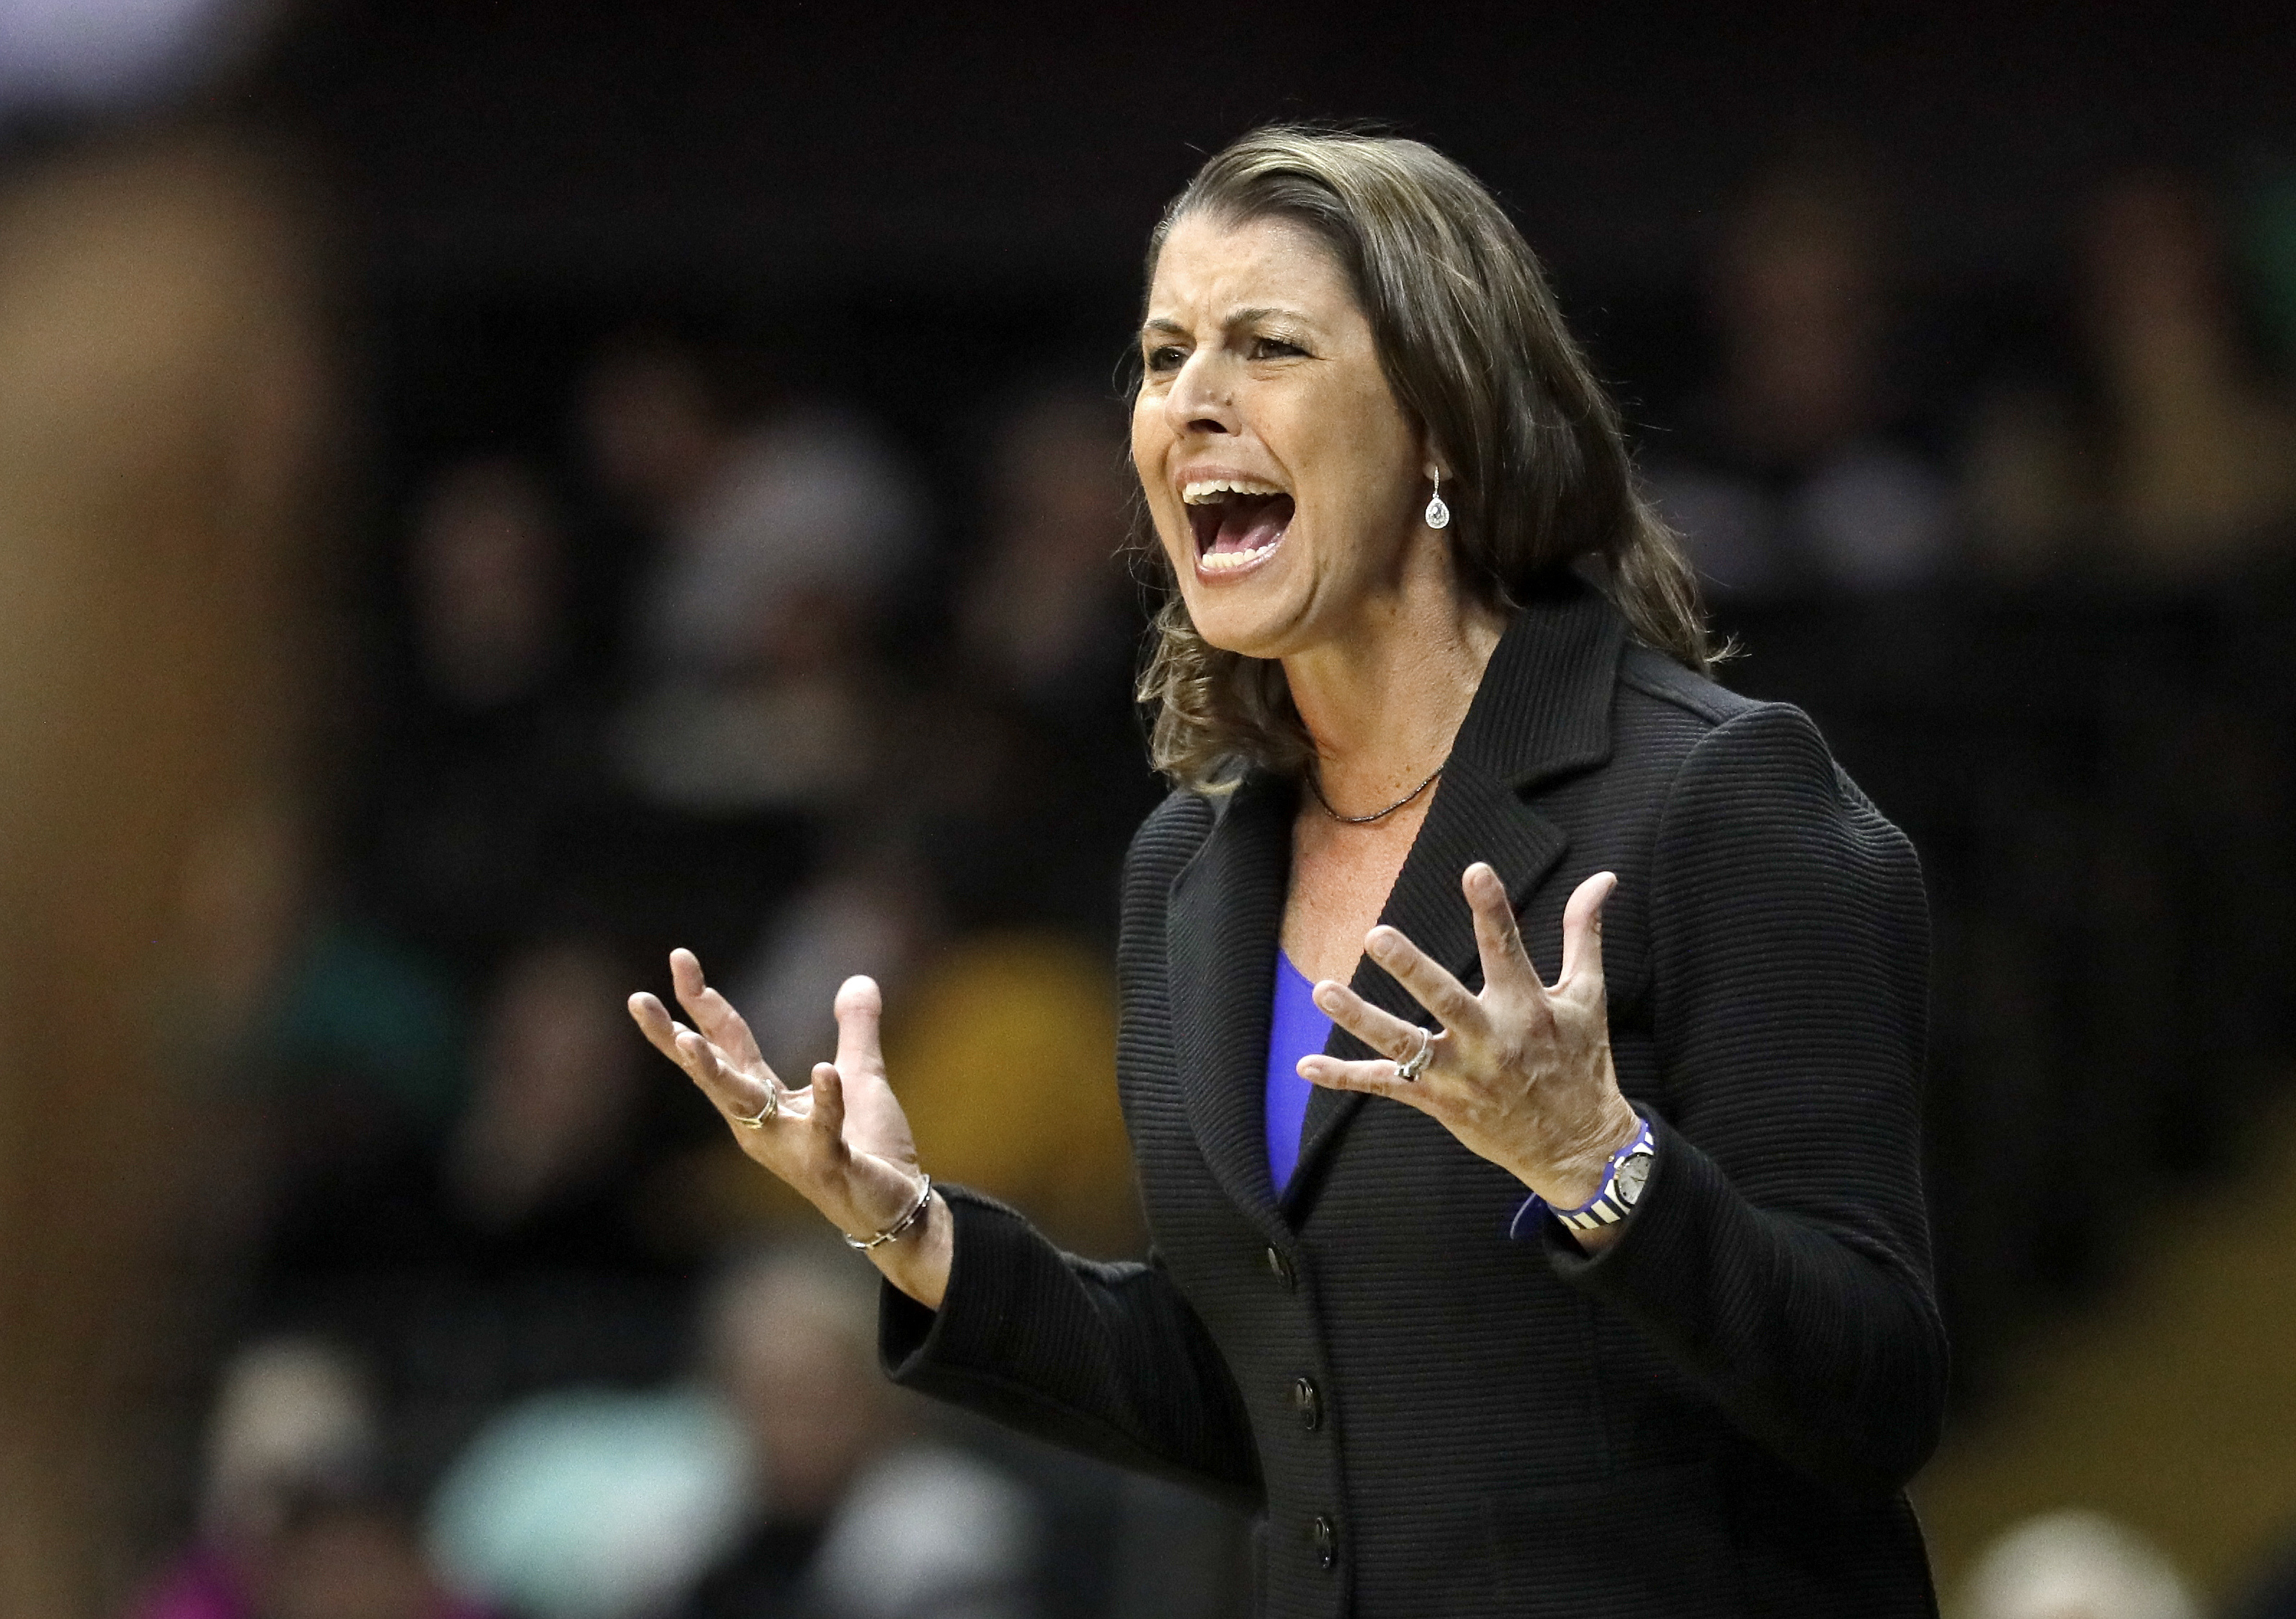 Duke head coach Joanne McCallie yells to her players in the first half of an NCAA college basketball game against Vanderbilt, Sunday, Nov. 20, 2016, in Nashville, Tenn. (AP Photo/Mark Humphrey)